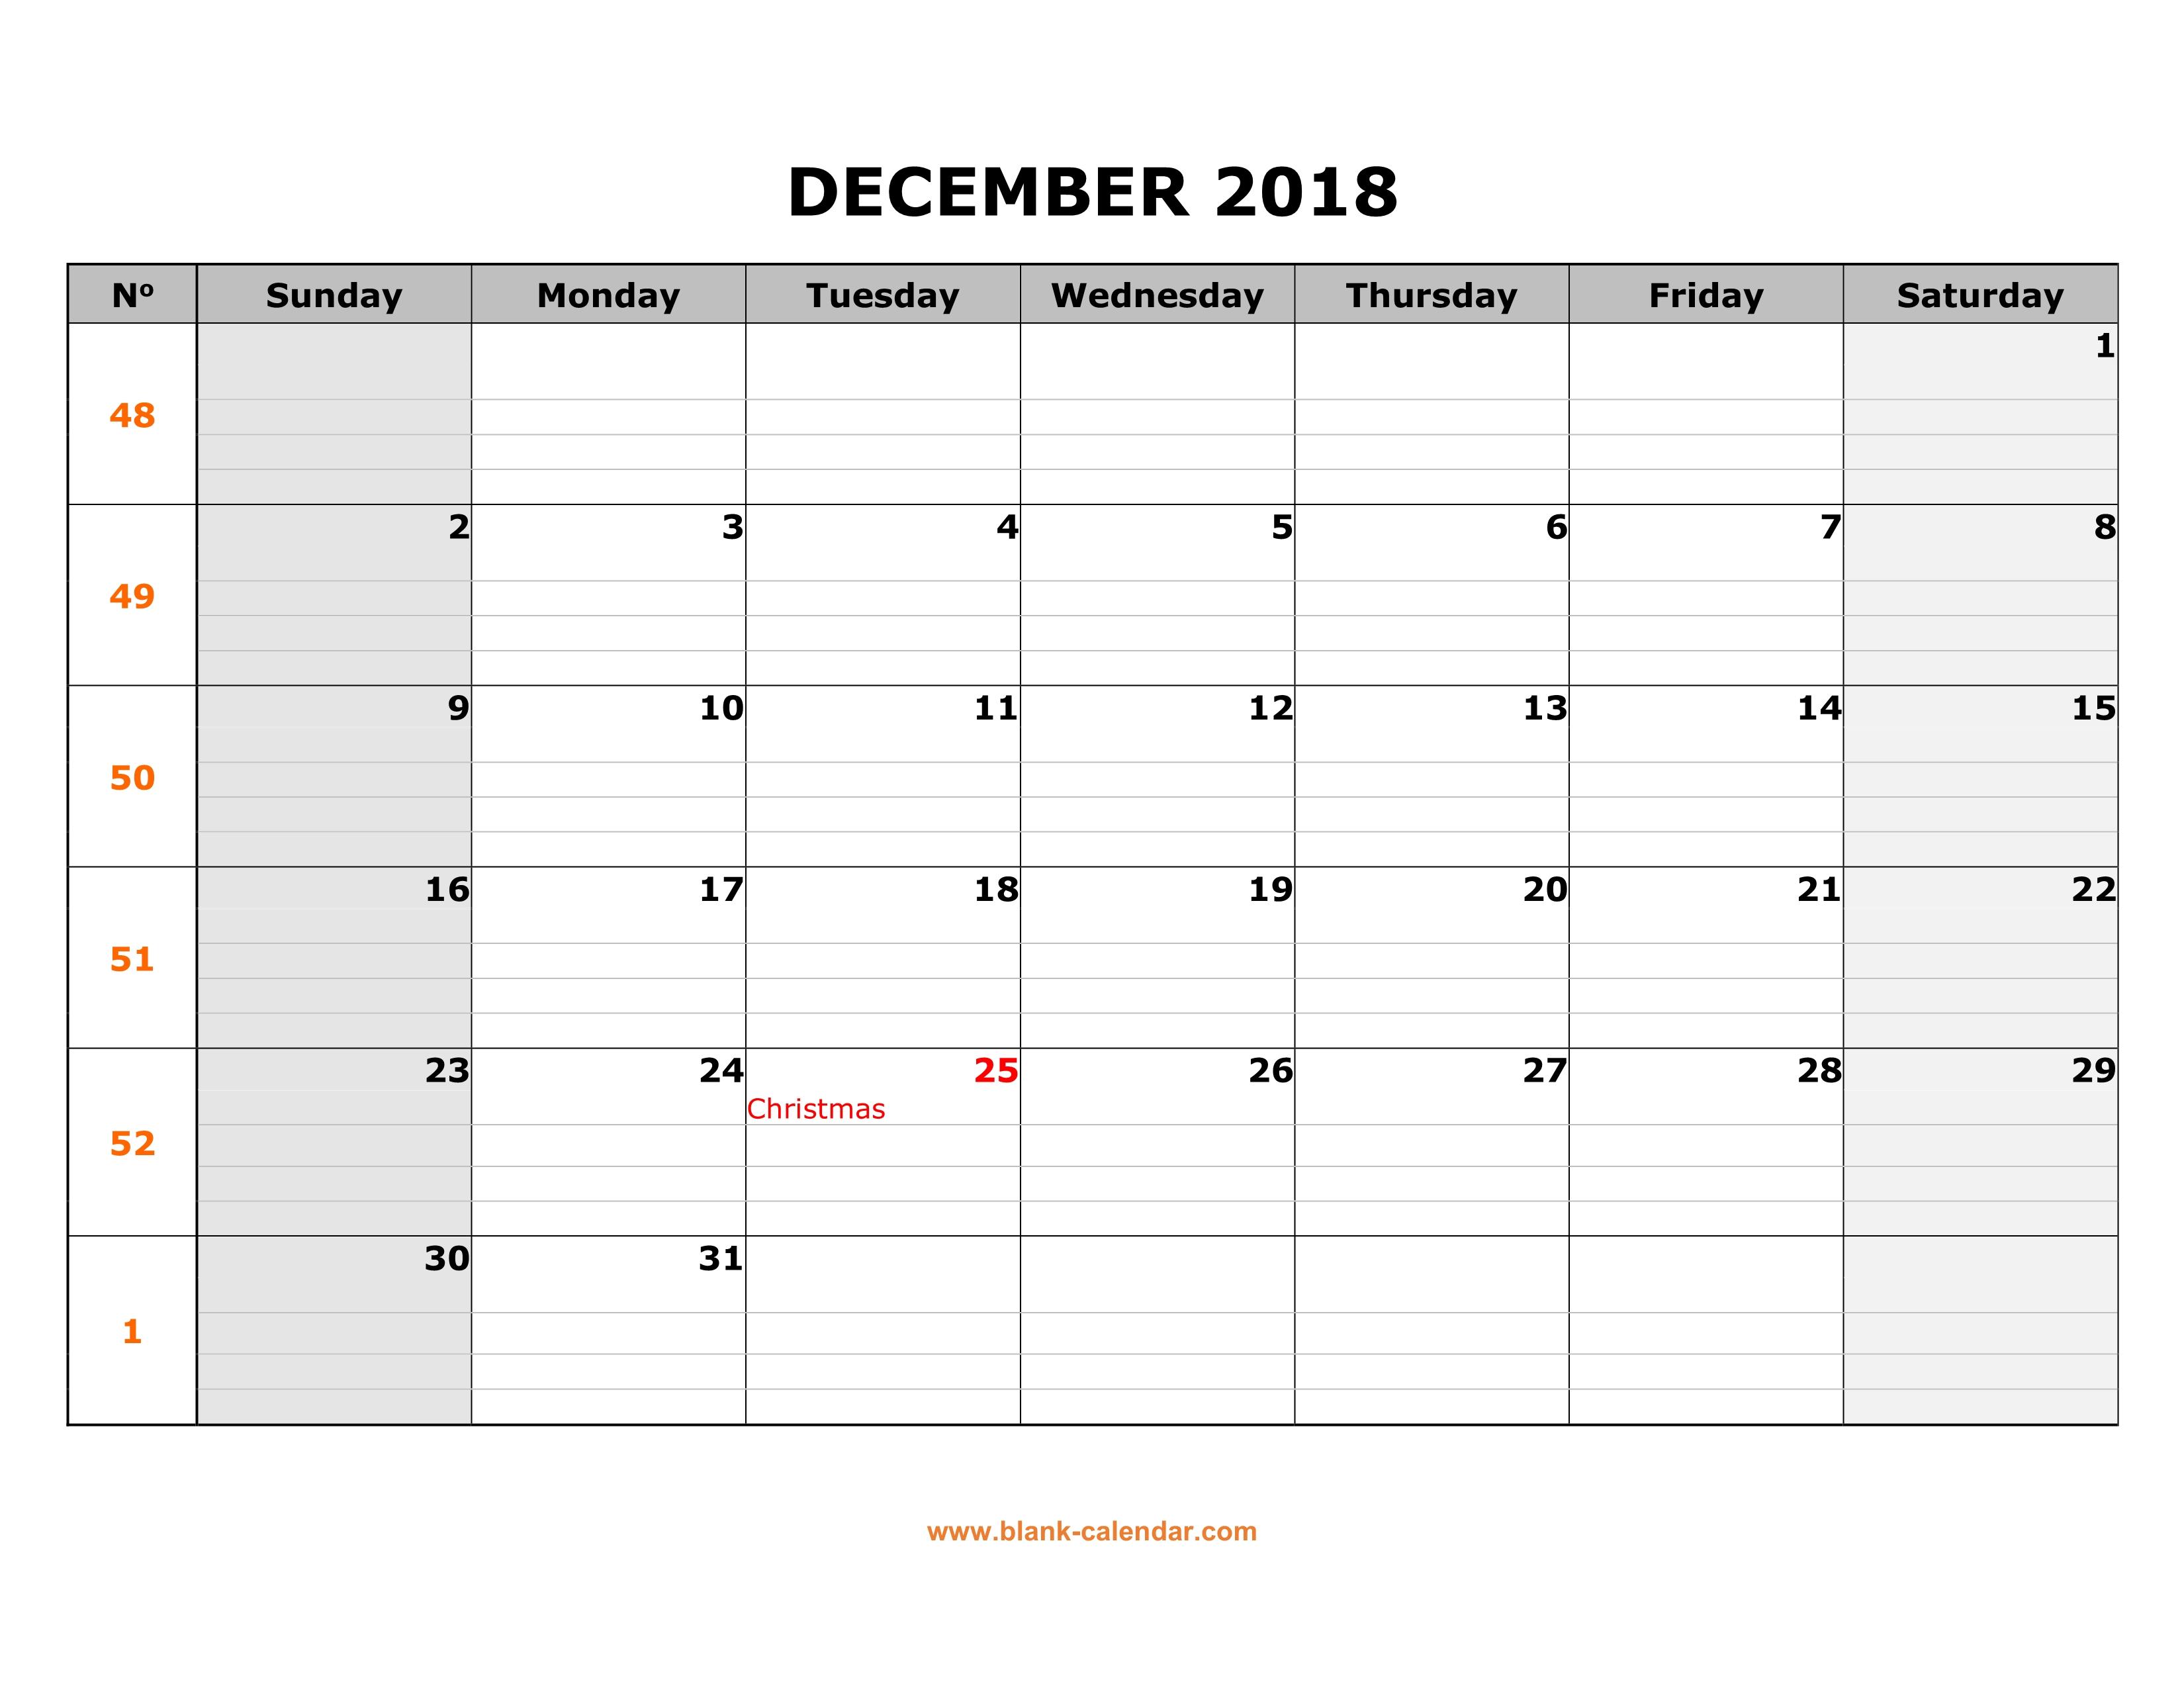 Free Download Printable December 2018 Calendar, Large Box Grid throughout Blank Calendars December Printable